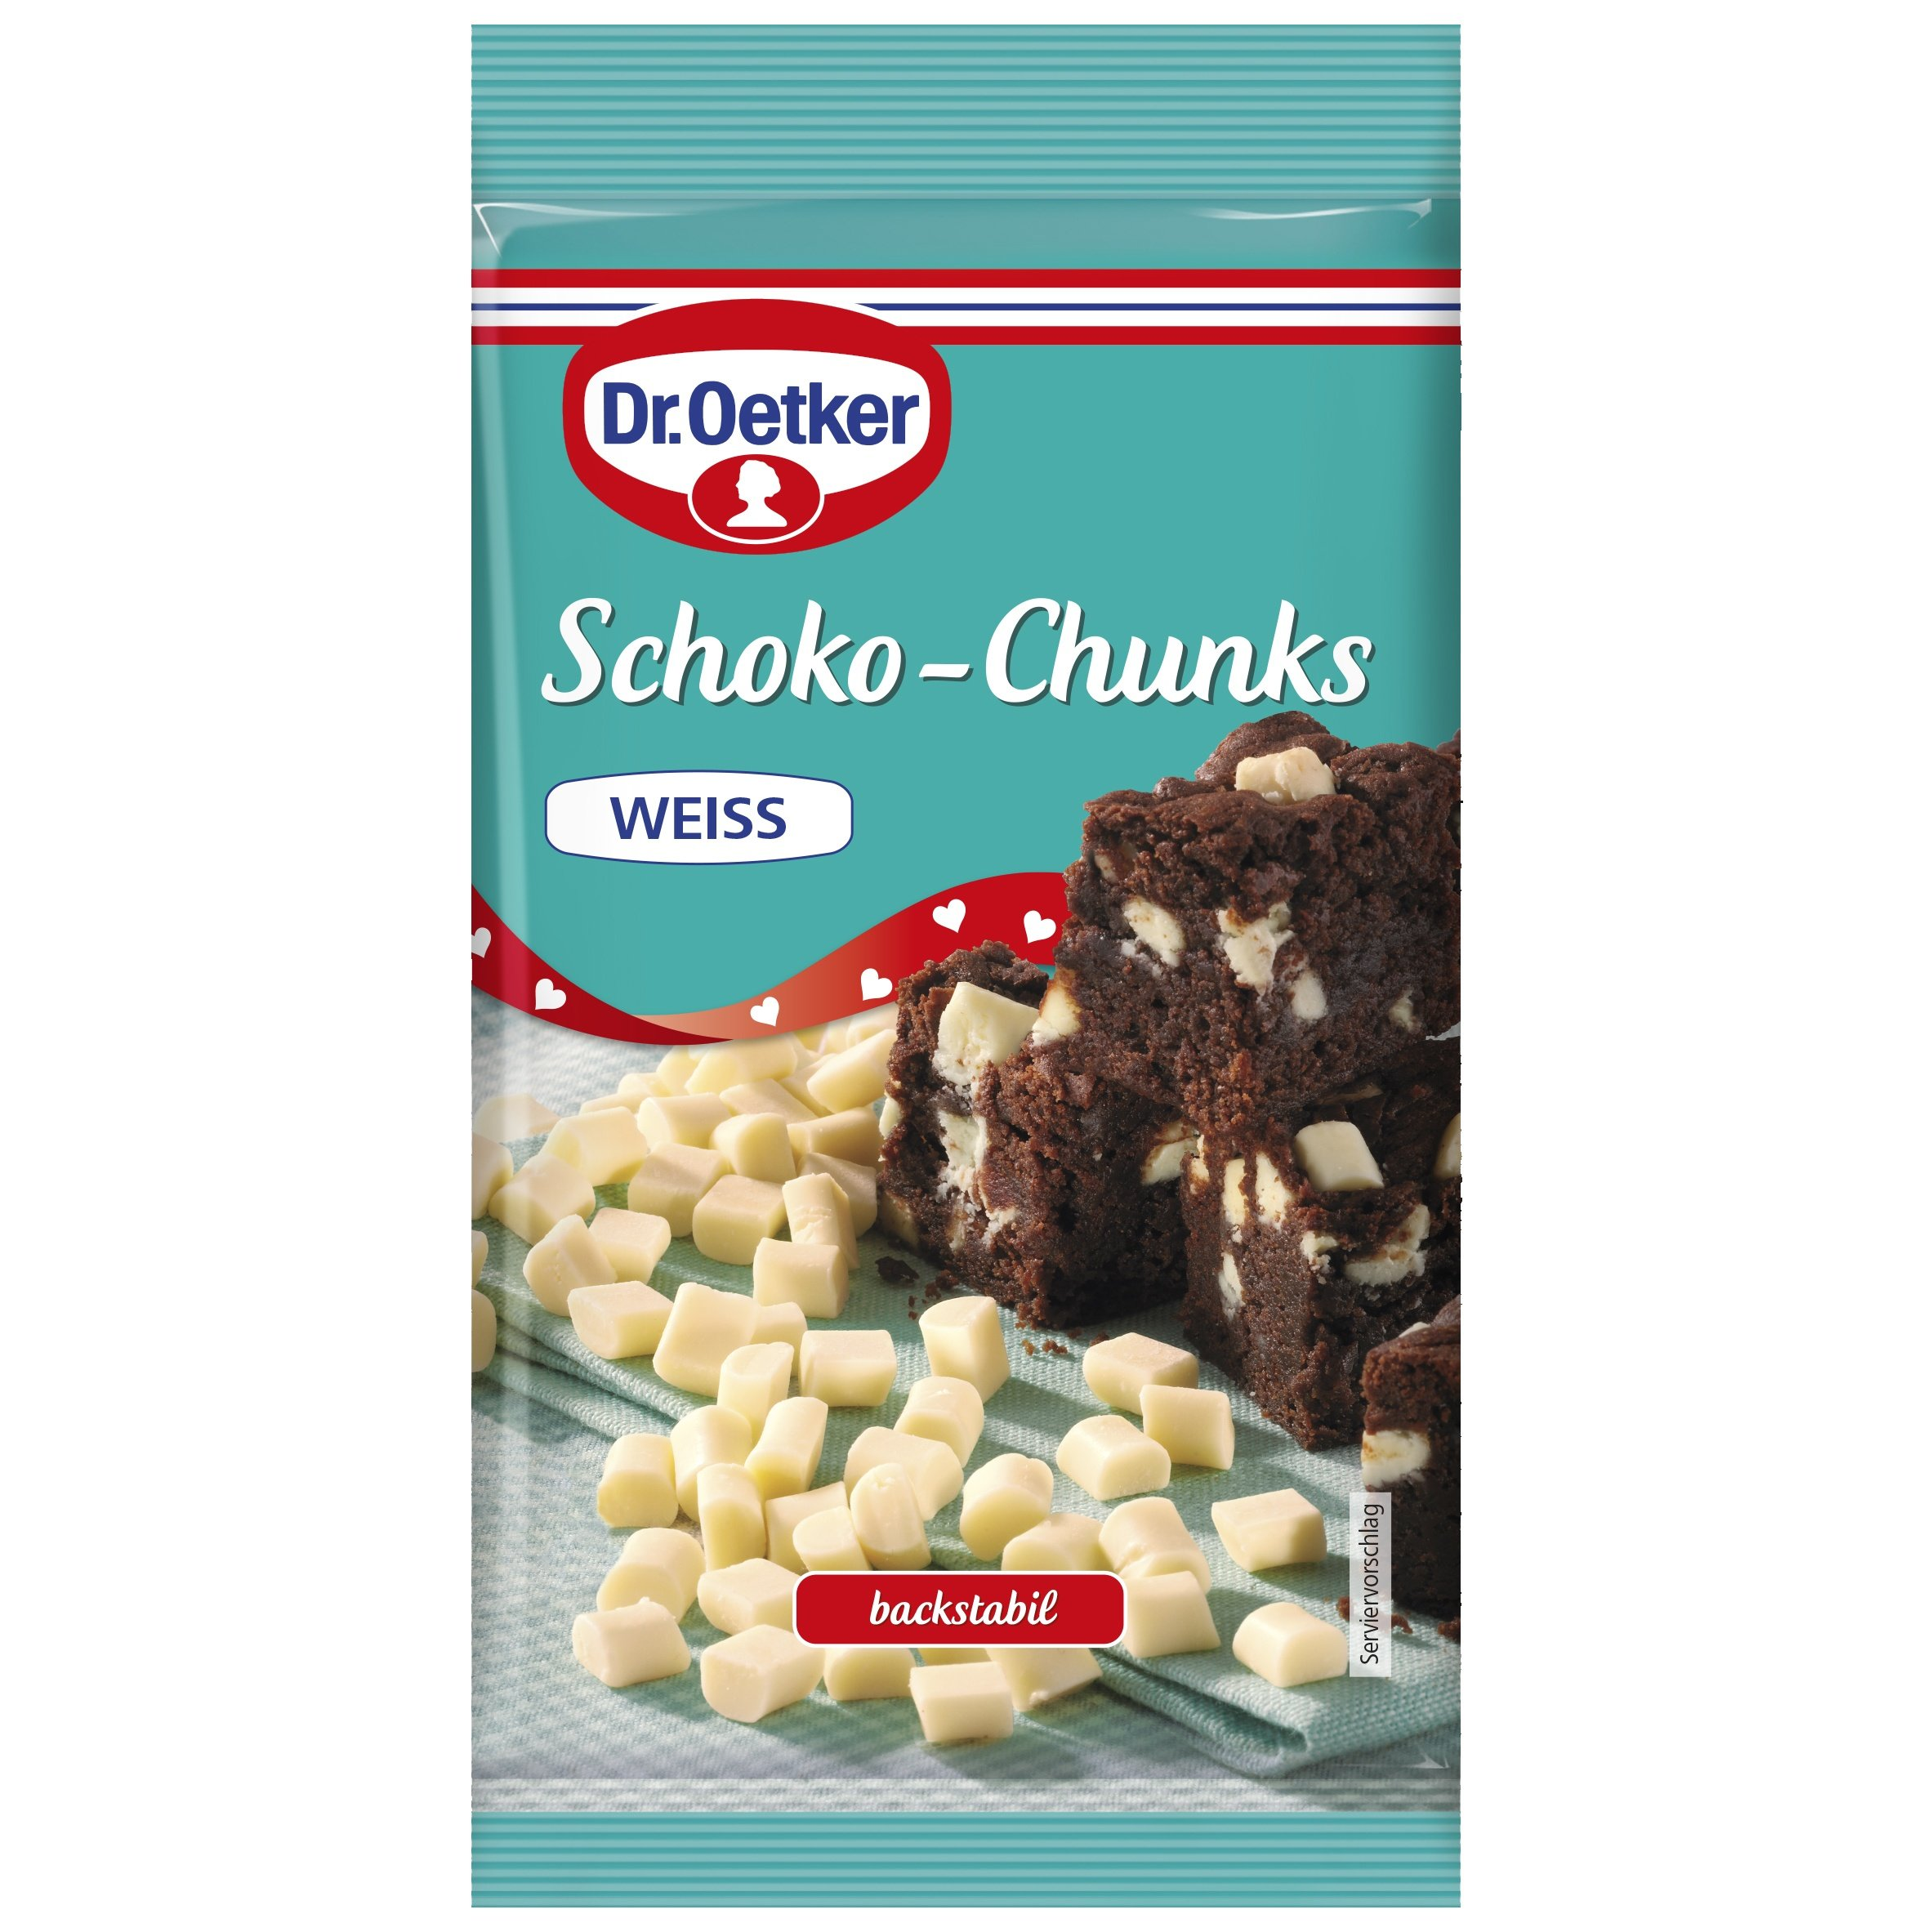 Dr. Oetker Schokolade Chunks Weiße Schokolade